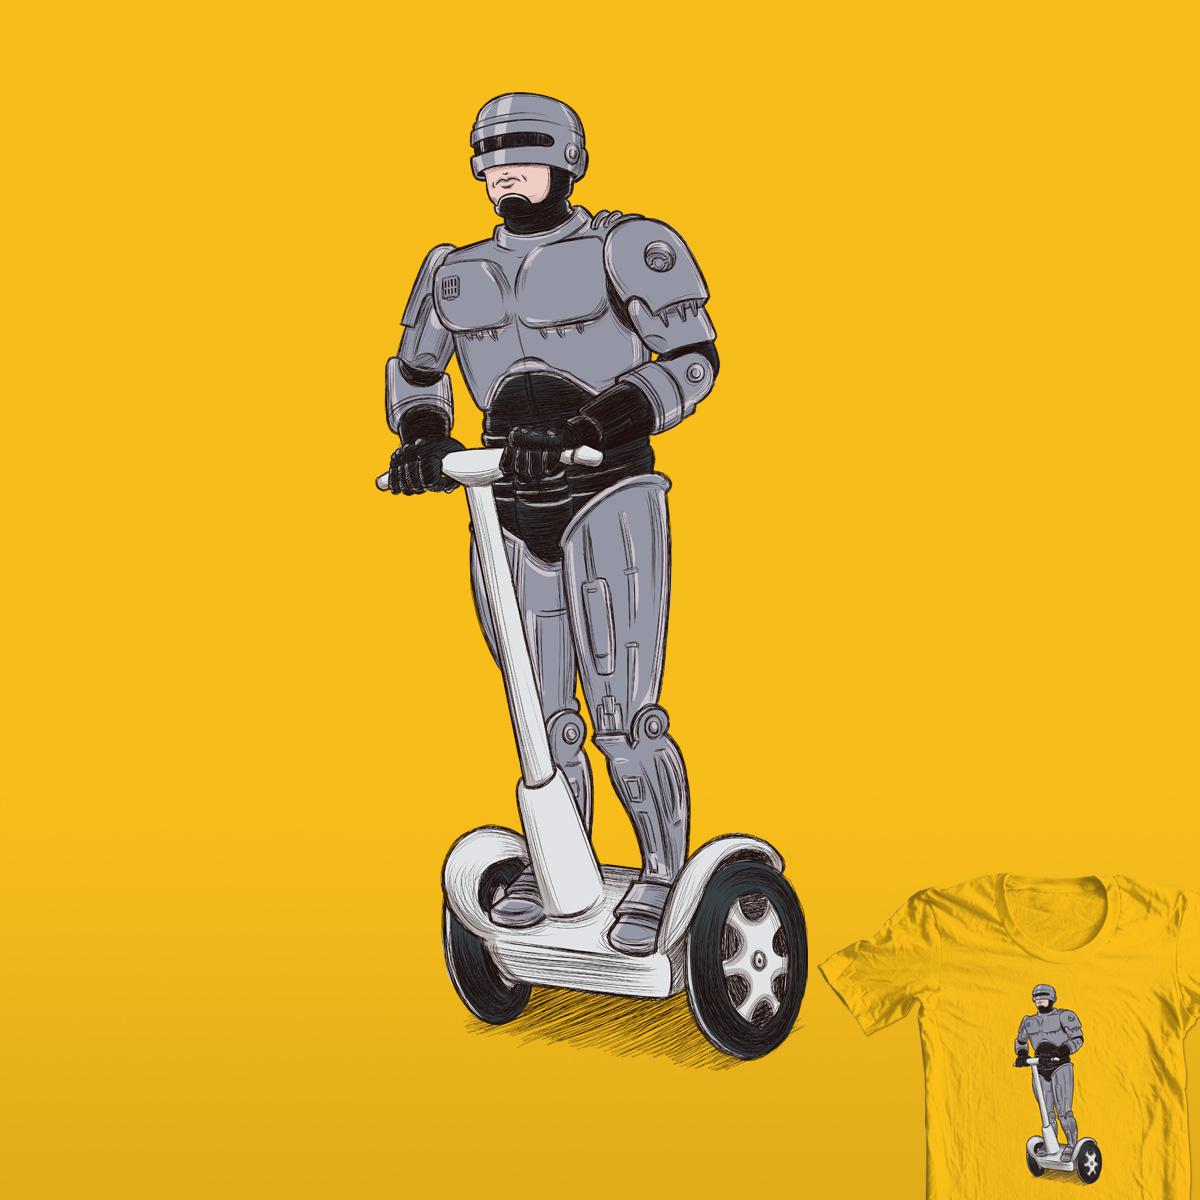 Segway RoboCop by Daviisilva and nintechno on Threadless